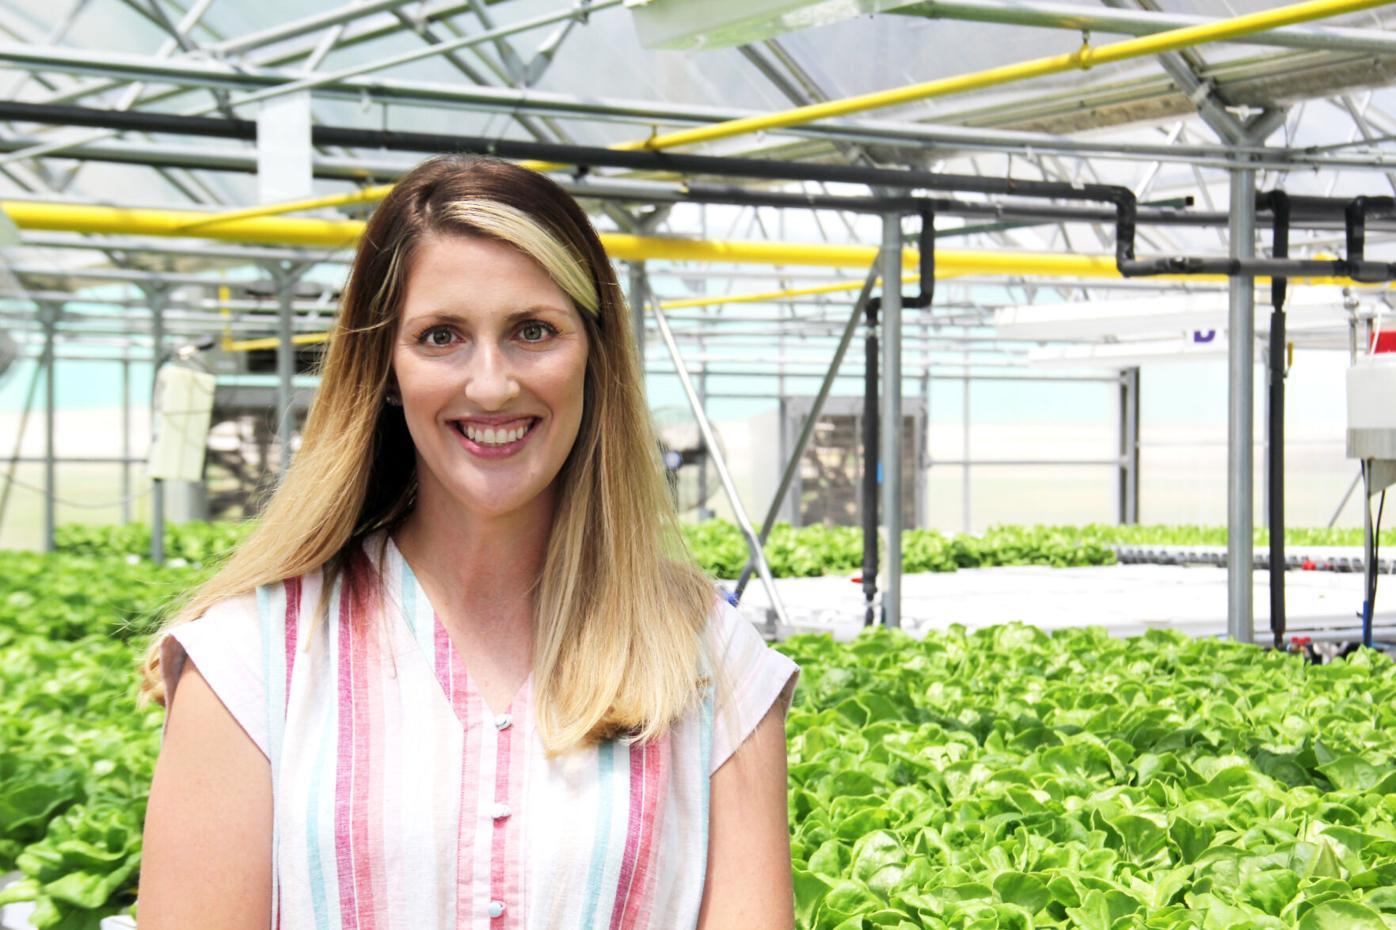 New director begins at Lettuce Dream